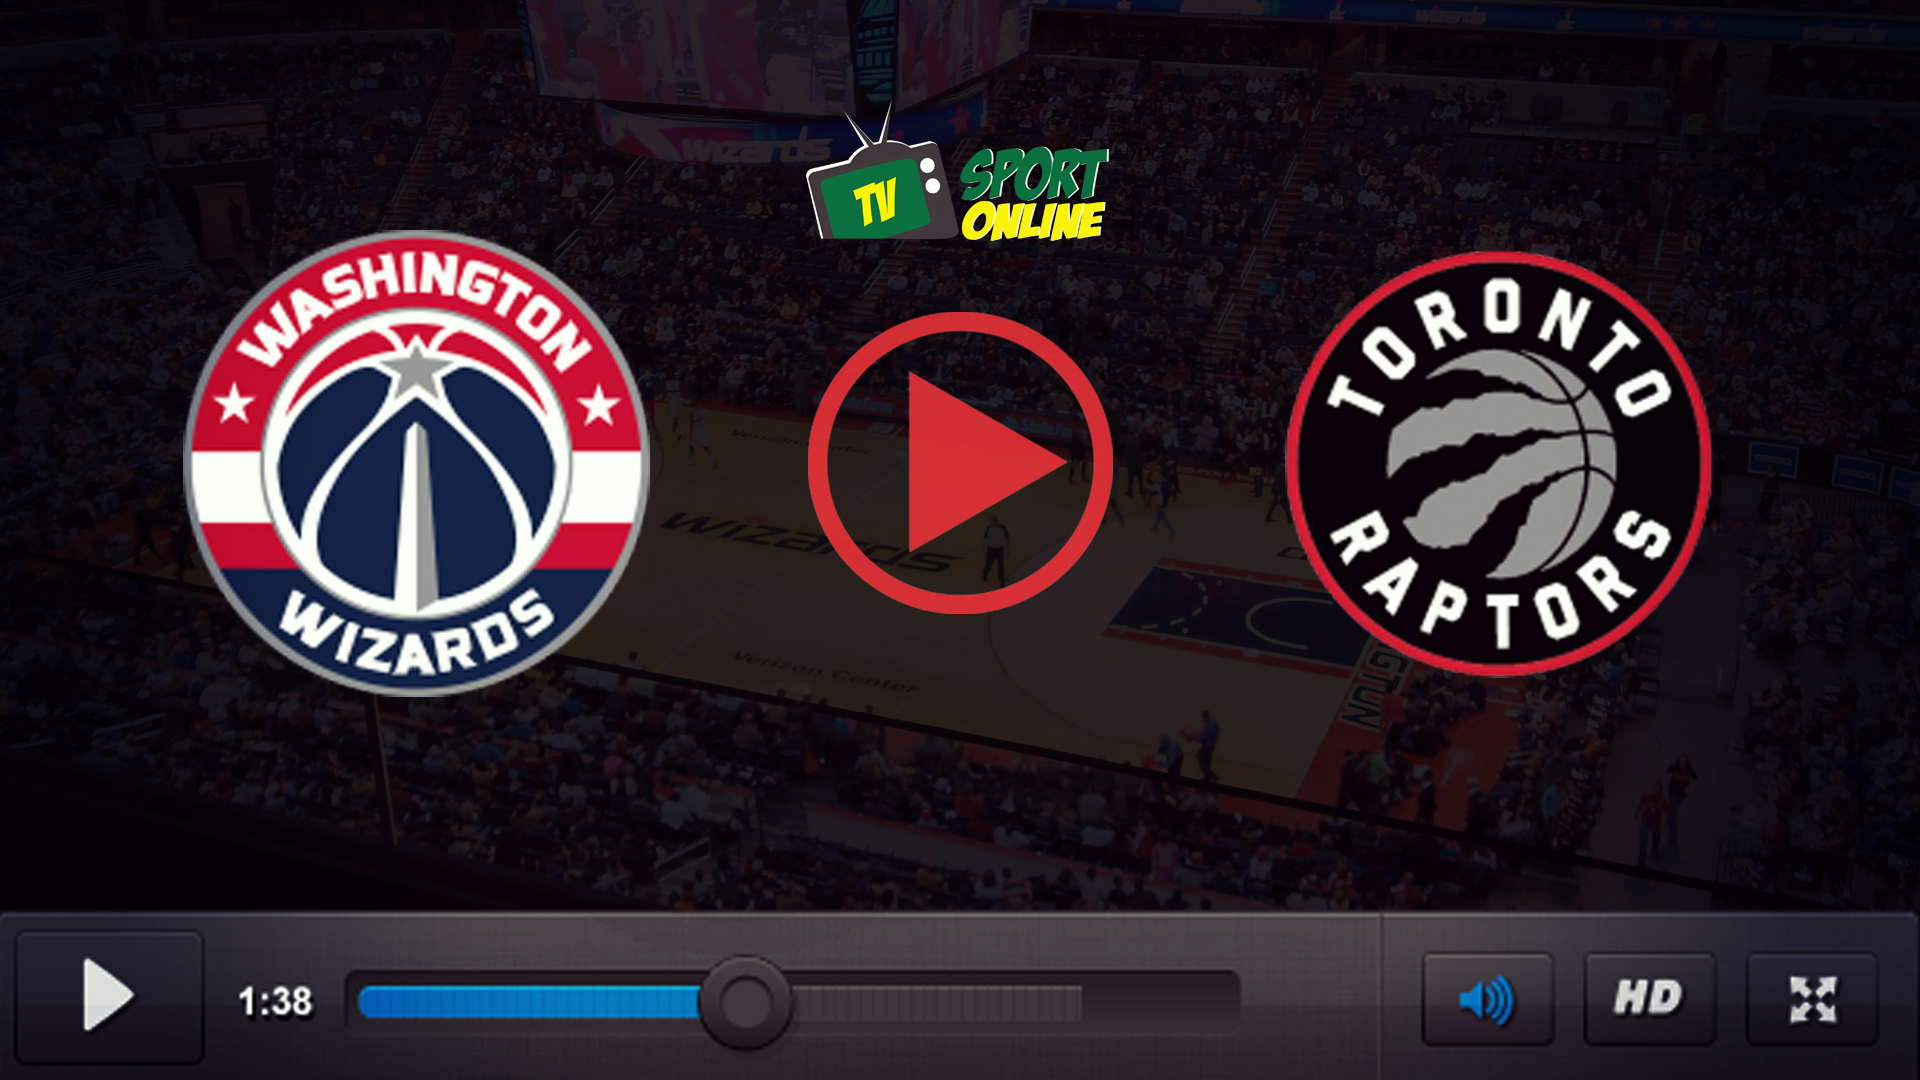 Watch Live Stream Washington Wizards – Toronto Raptors